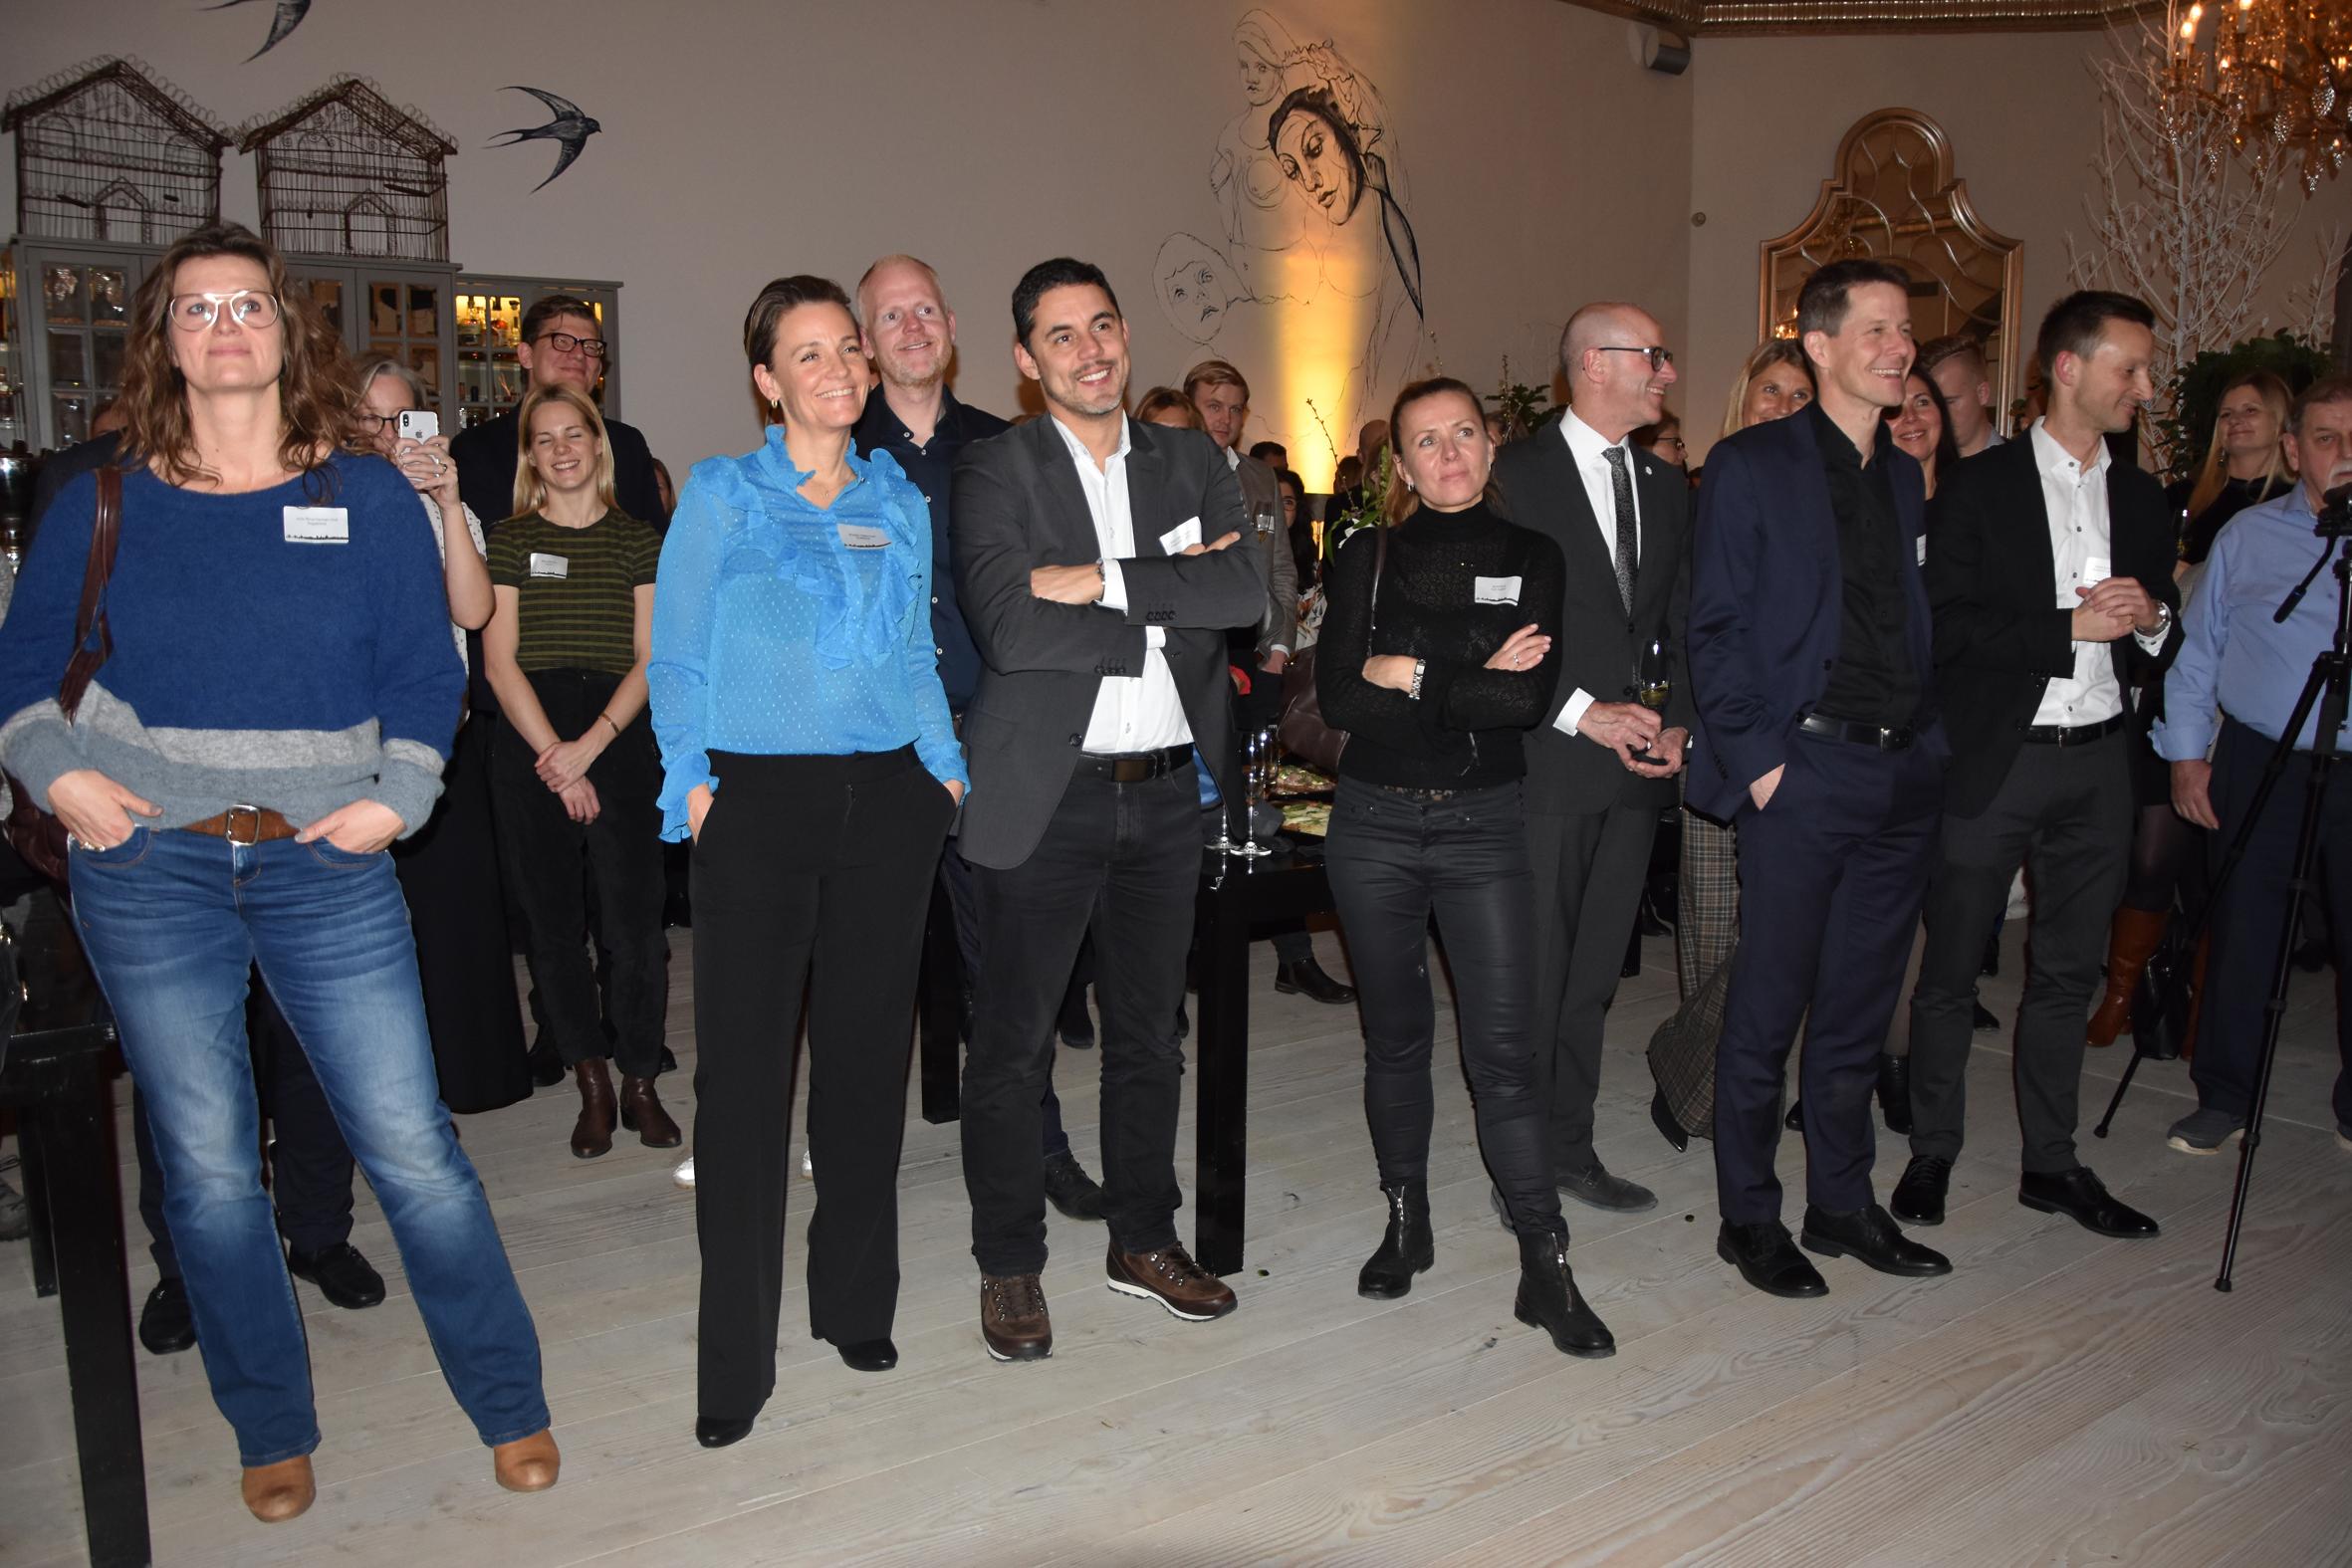 Gæster ved nytårskuren hos VisitDenmark og Wonderful Copenhagen lytter til indlæg fra scenen. Foto: Preben Pathuel.